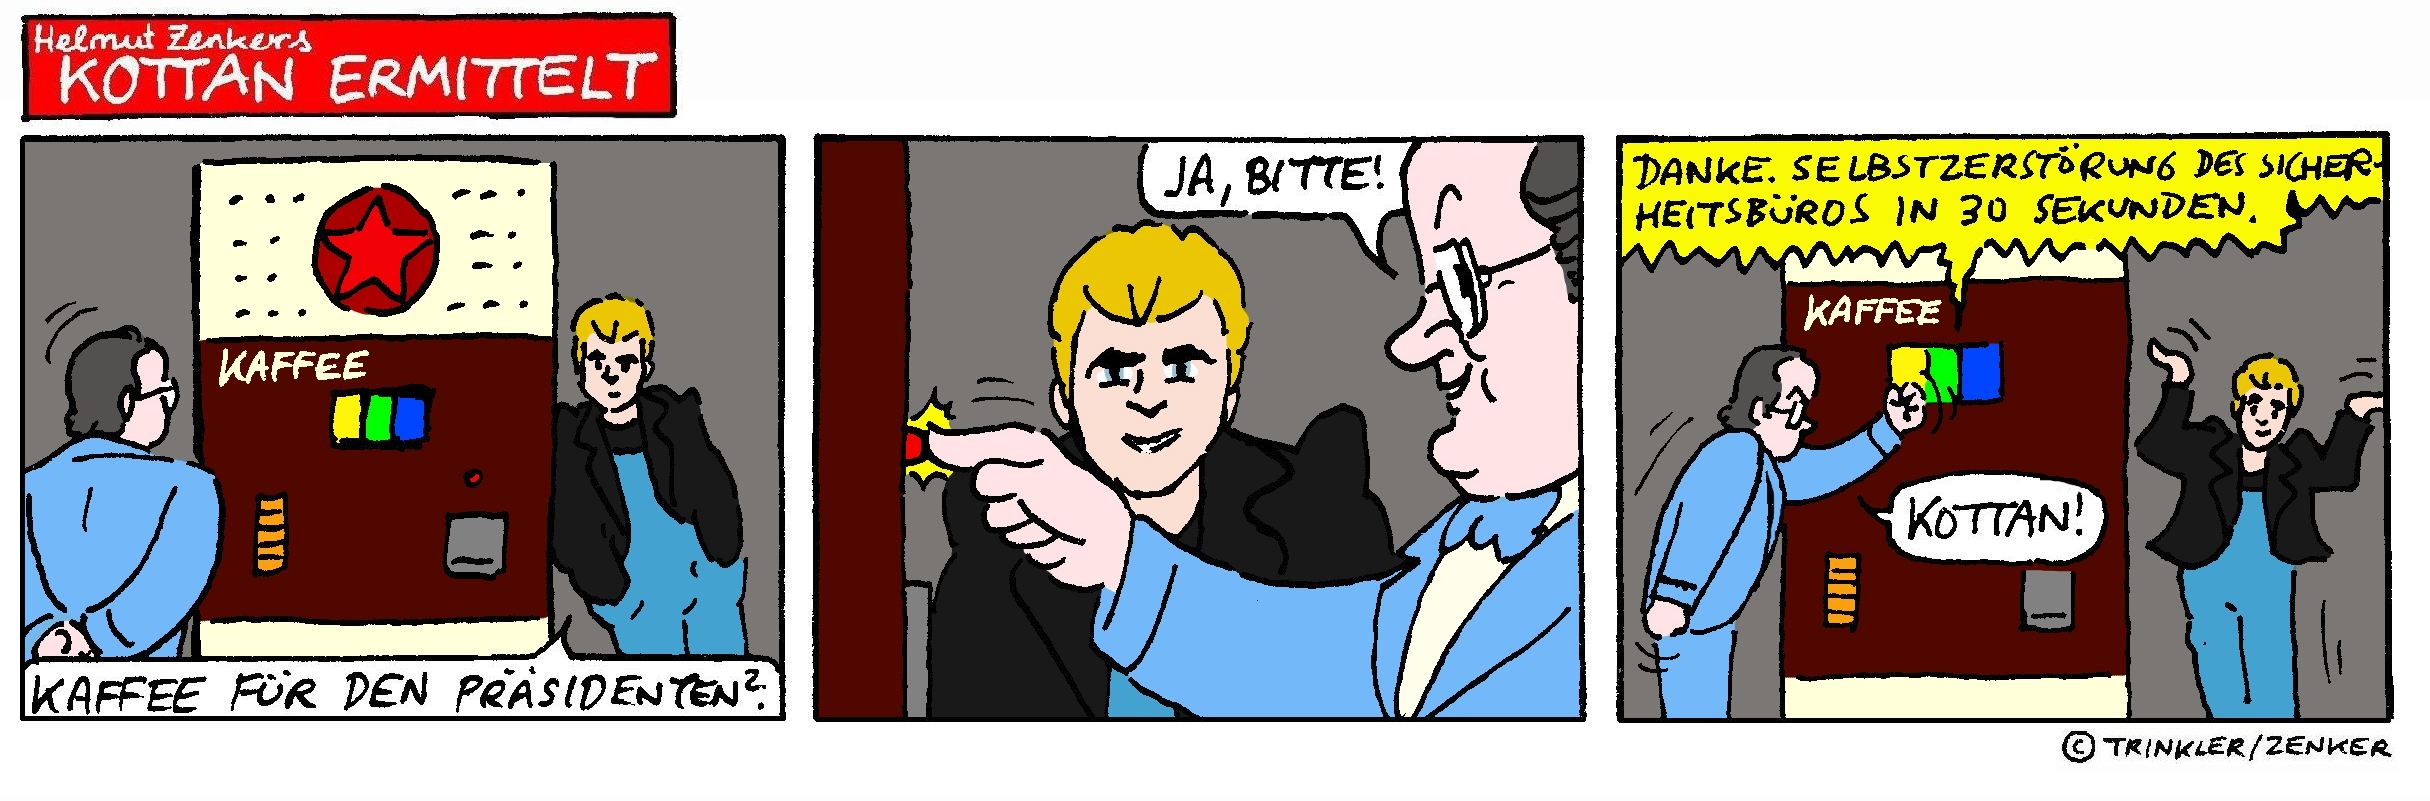 Kottan ermittelt - Comicstrip Nr. 13